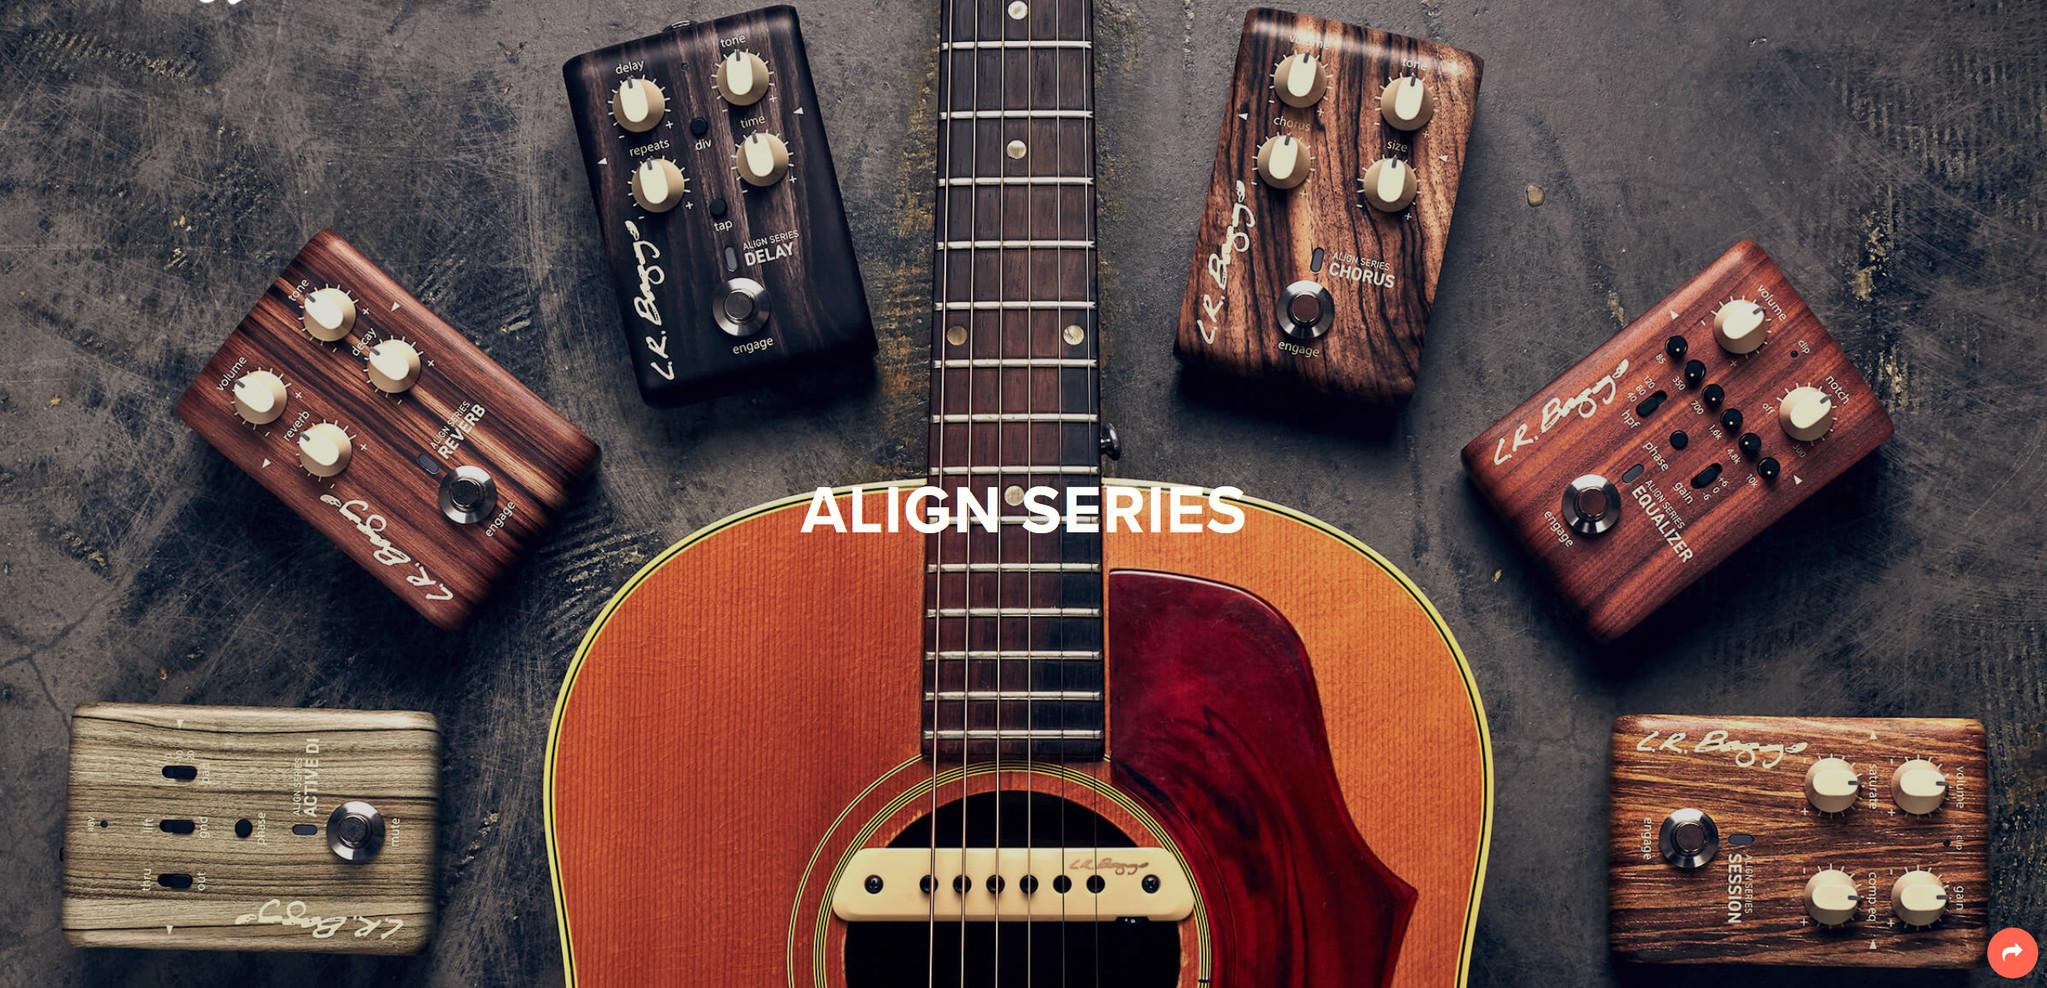 De LR Baggs Align Series | Akoestiche Gitaar Pedalen